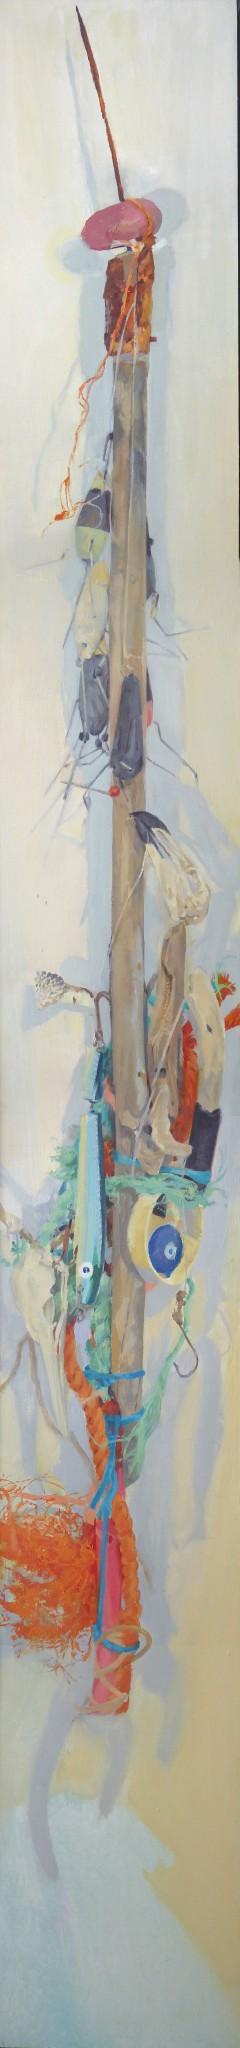 John Wiltshire Fishslab Gallery